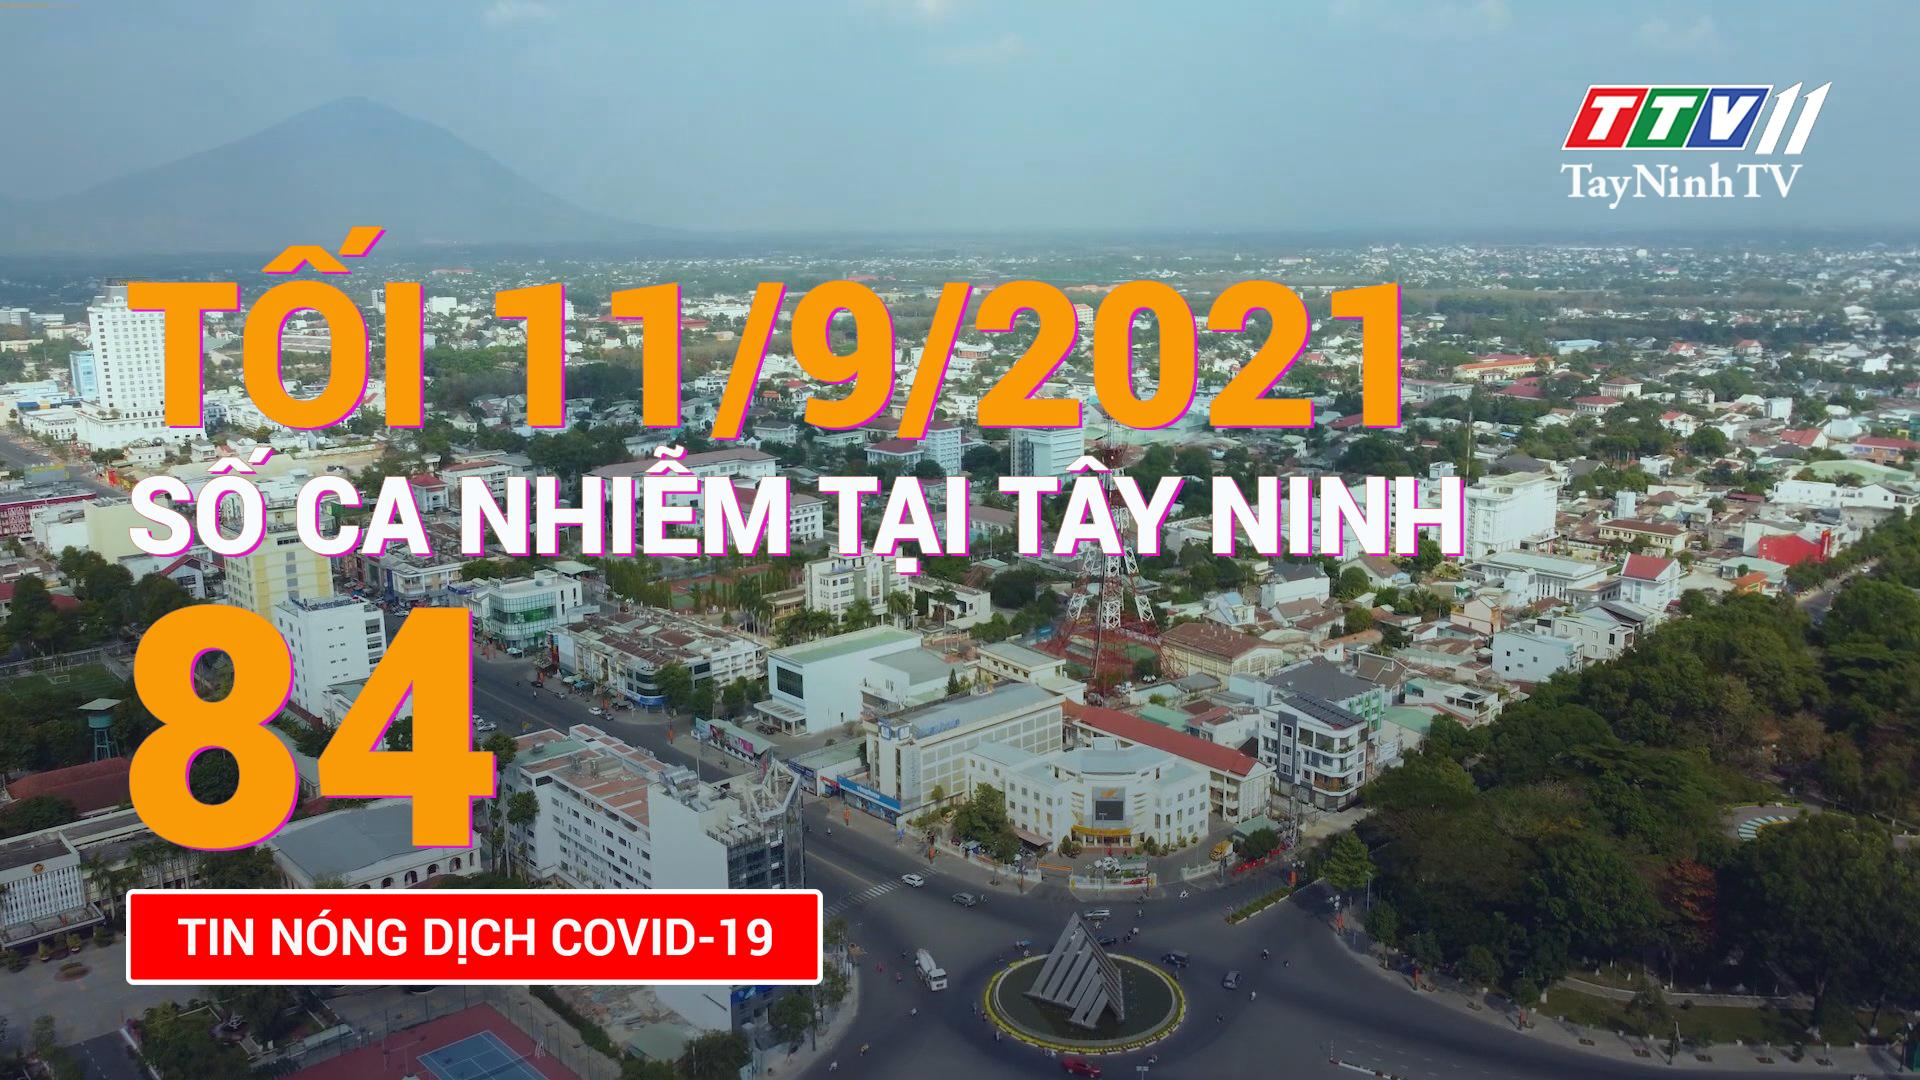 Tin tức Covid-19 tối 11/9/2021 | TayNinhTV